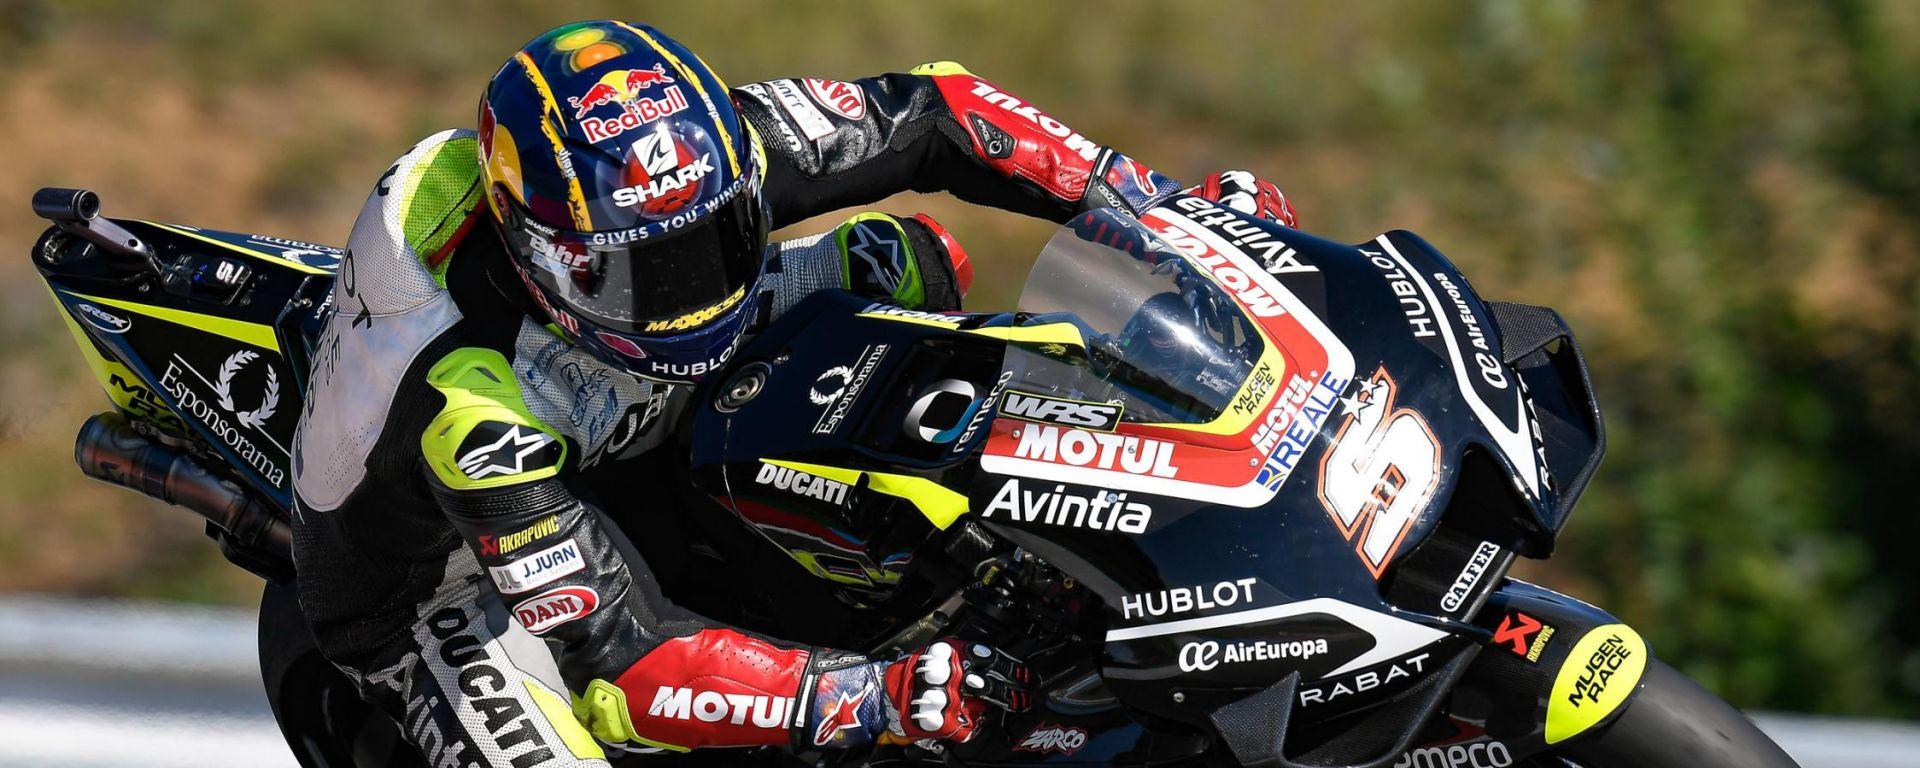 MotoGP Rep Ceca 2020, Brno: Johann Zarco (Ducati)